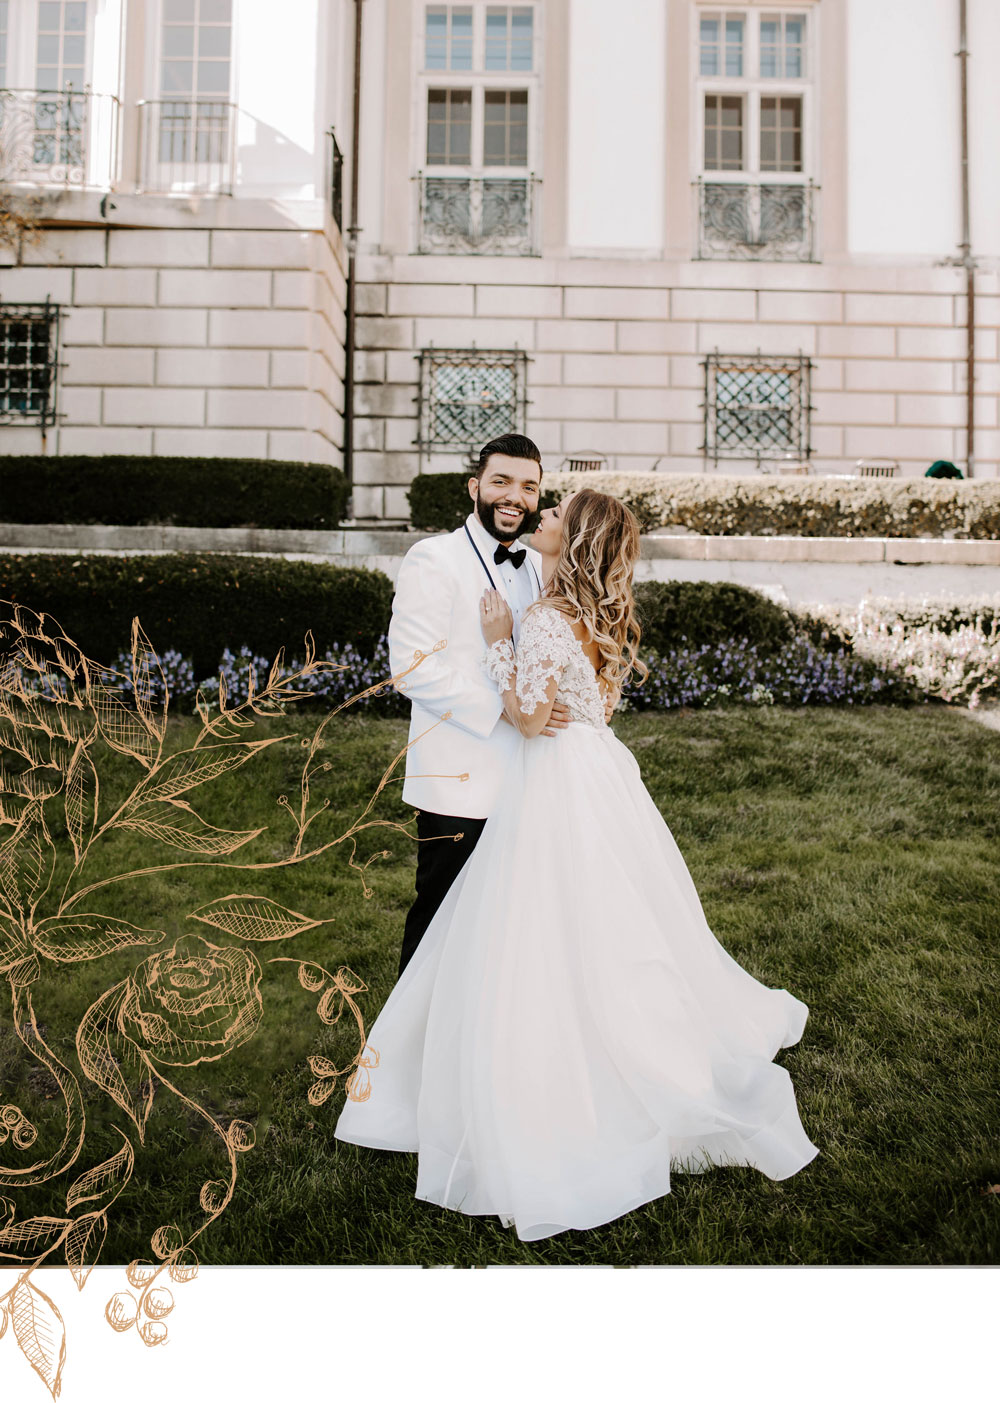 Botanical-Overlay-Lindsay-Kenney-wedding-planner.jpg